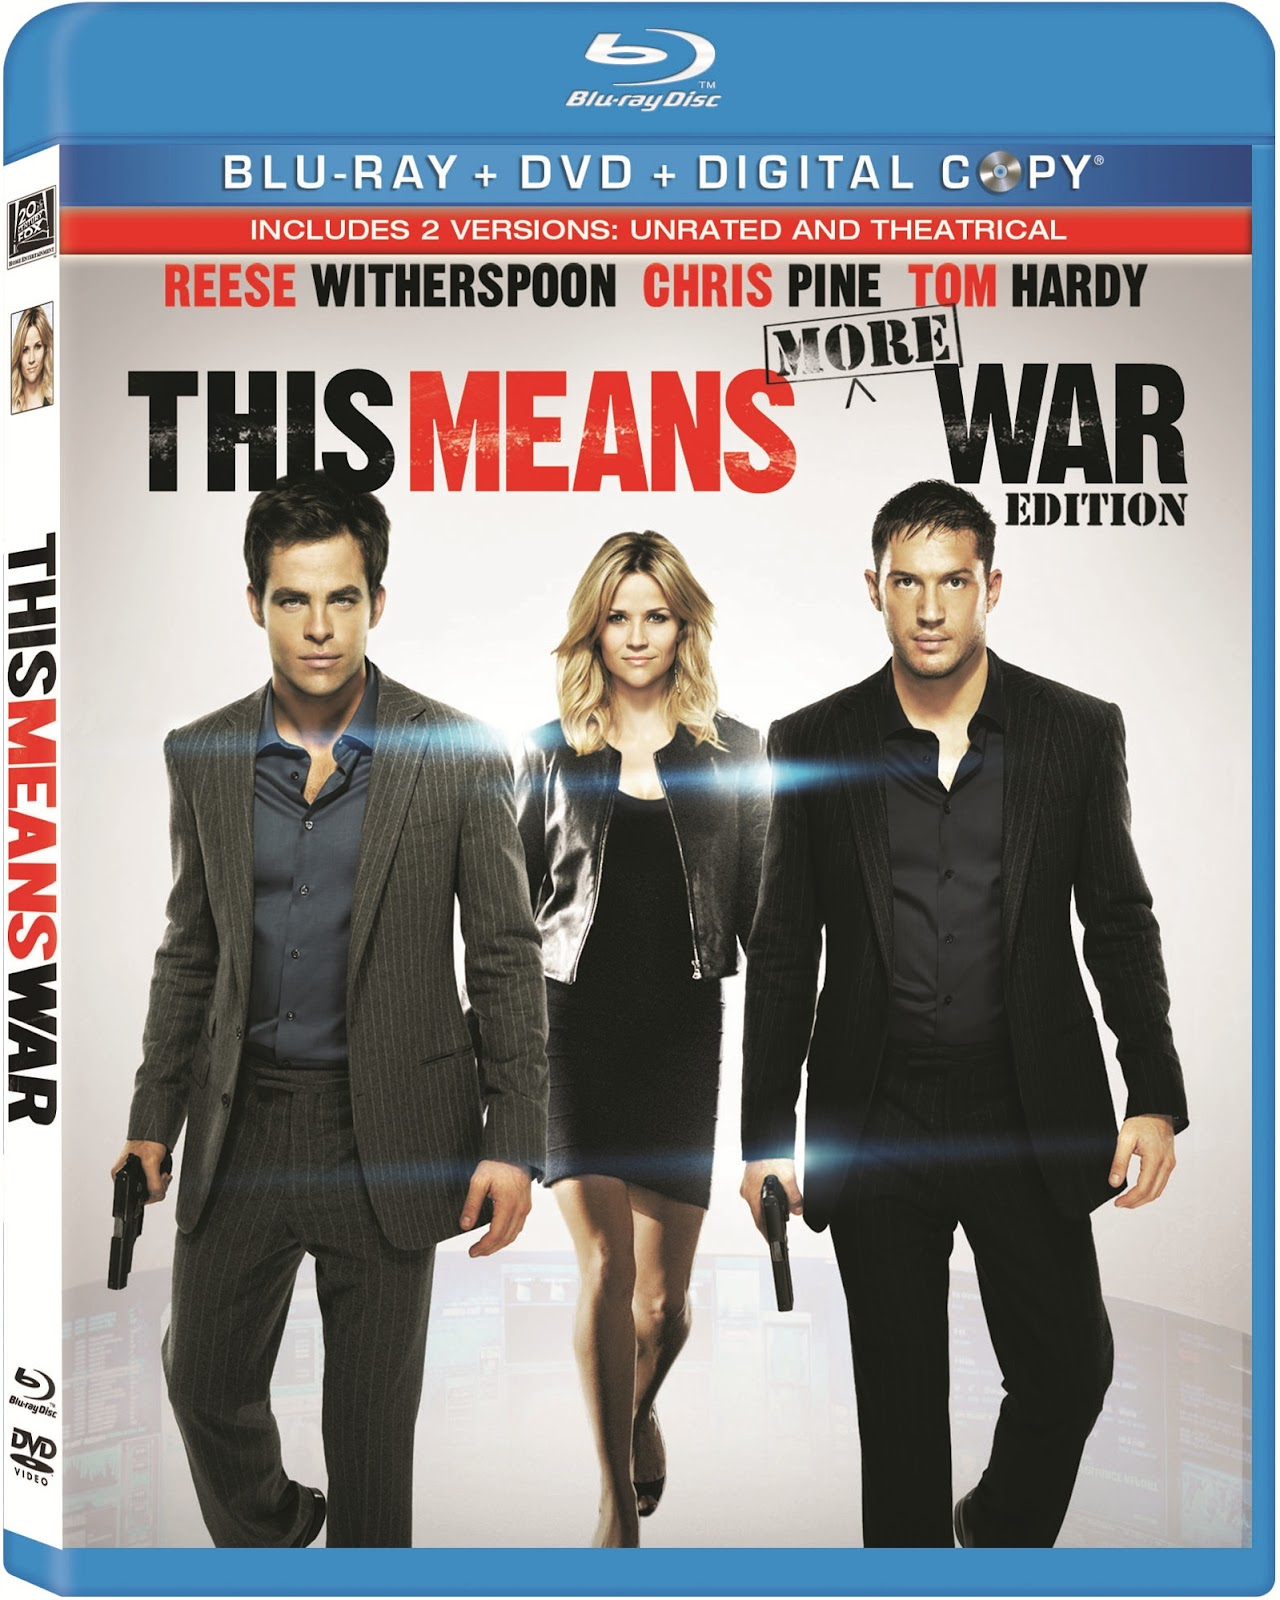 http://1.bp.blogspot.com/-wqwCRzAdgdw/T7C92GS9ohI/AAAAAAAACHI/-KHLsu9VBsU/s1600/This+Means+War+Blu-Ray.jpg